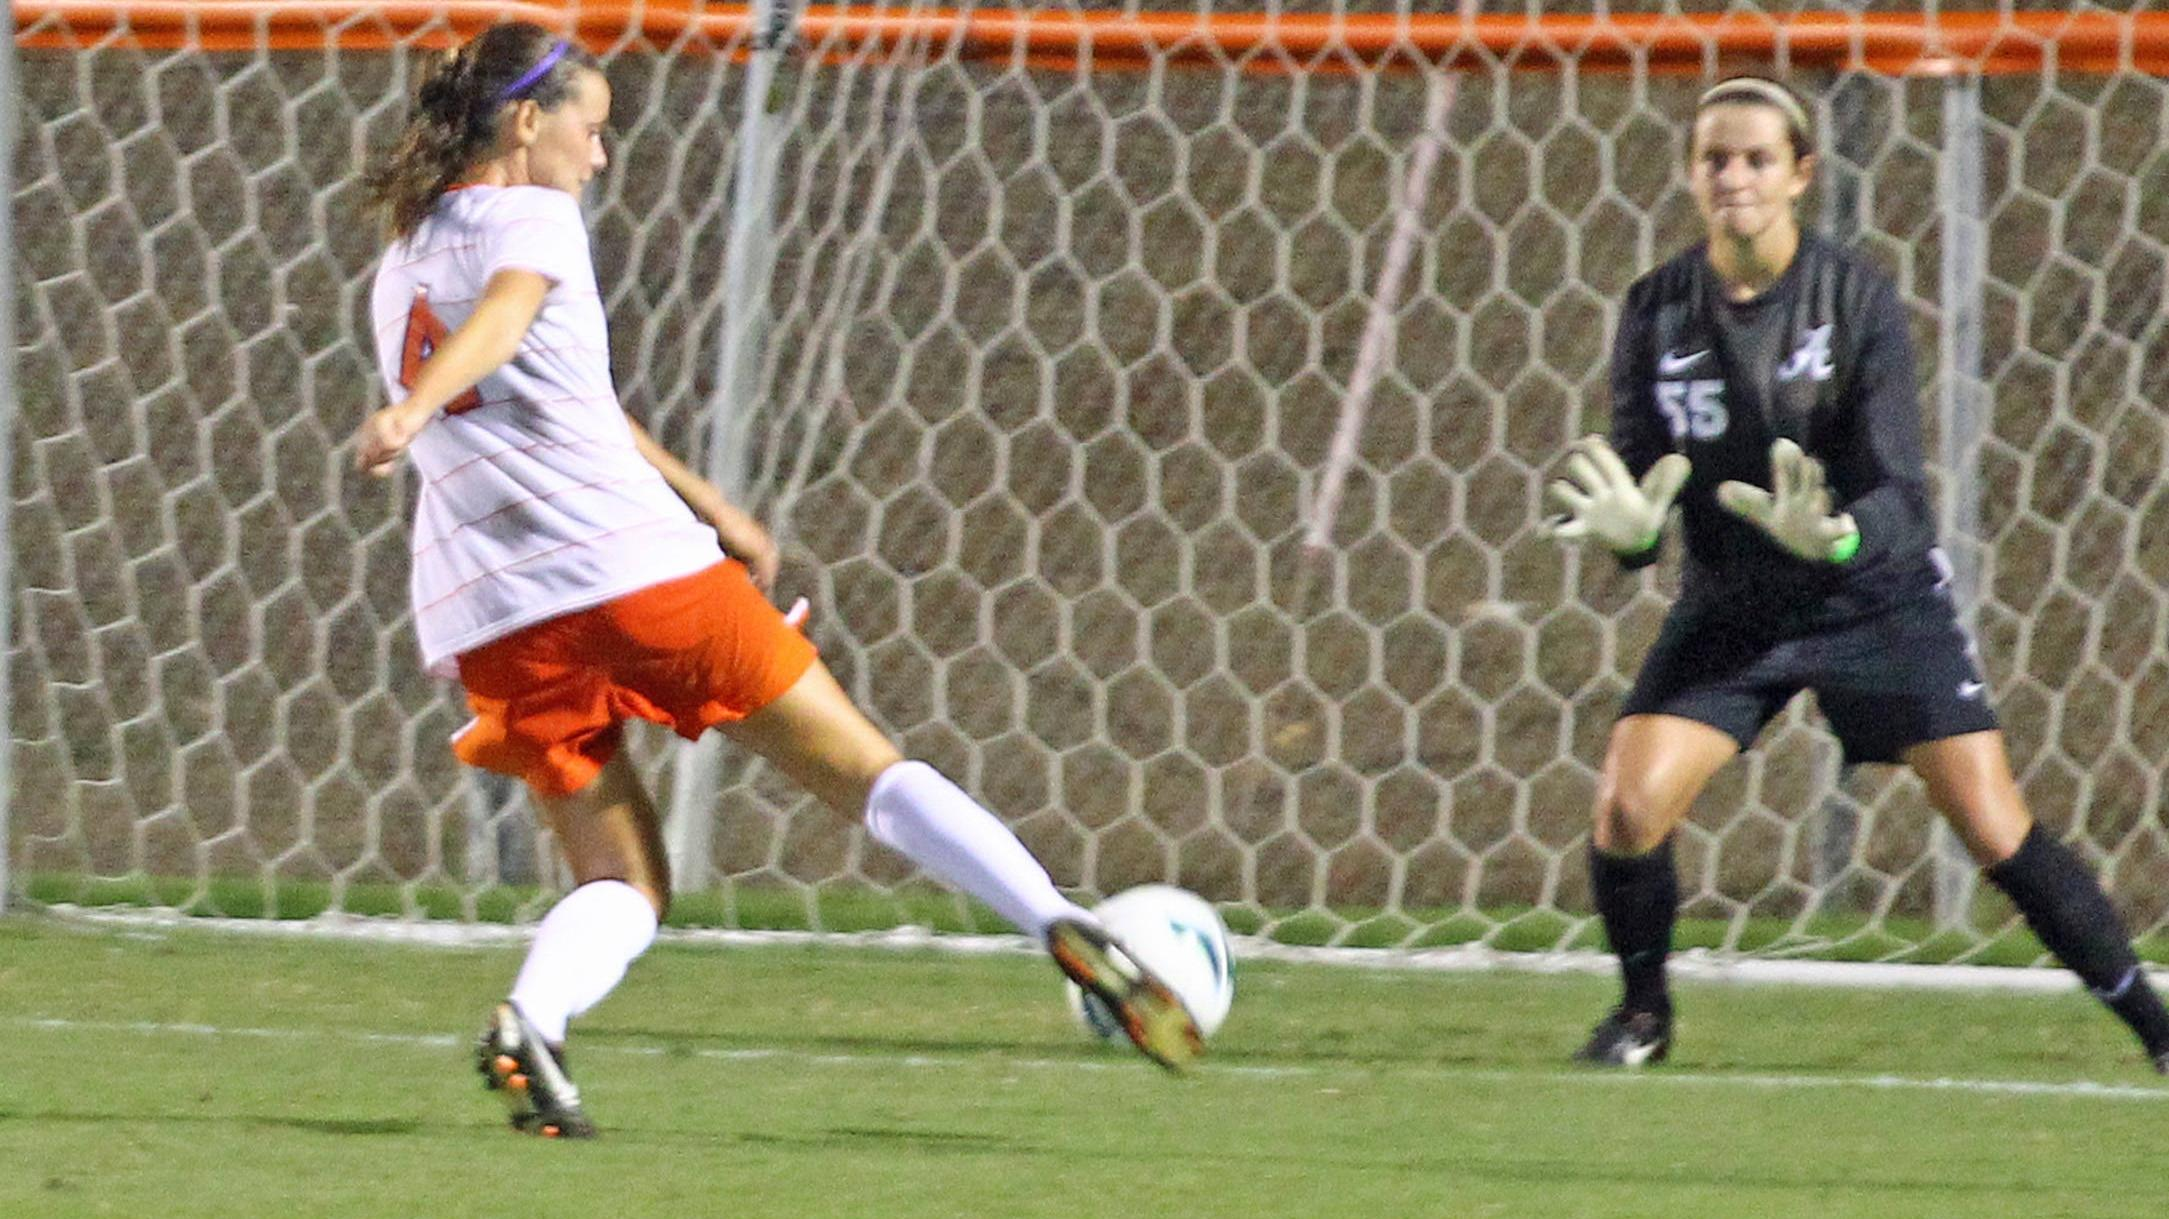 Clemson Women's Soccer Team Defeats Alabama, 1-0, in Exhibition Game Saturday